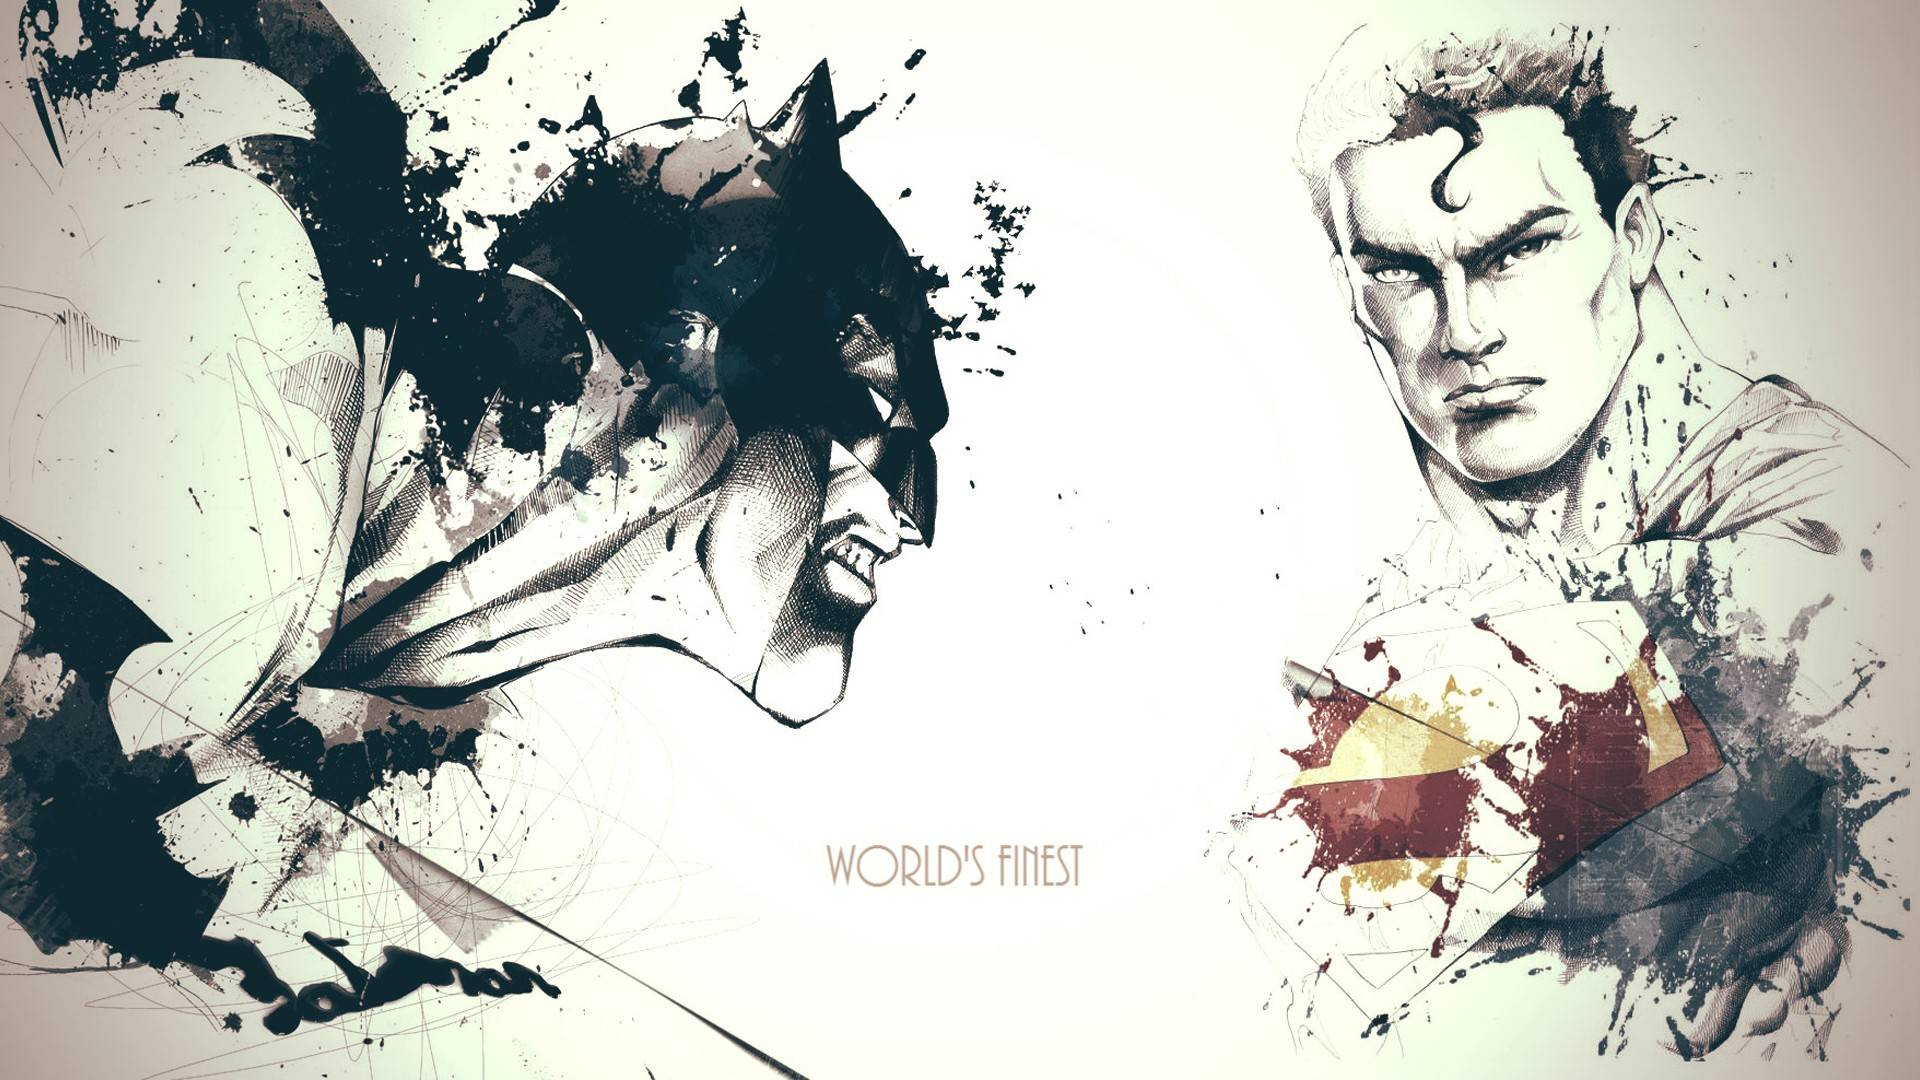 superman vs batman   Superman Picture 1920x1080